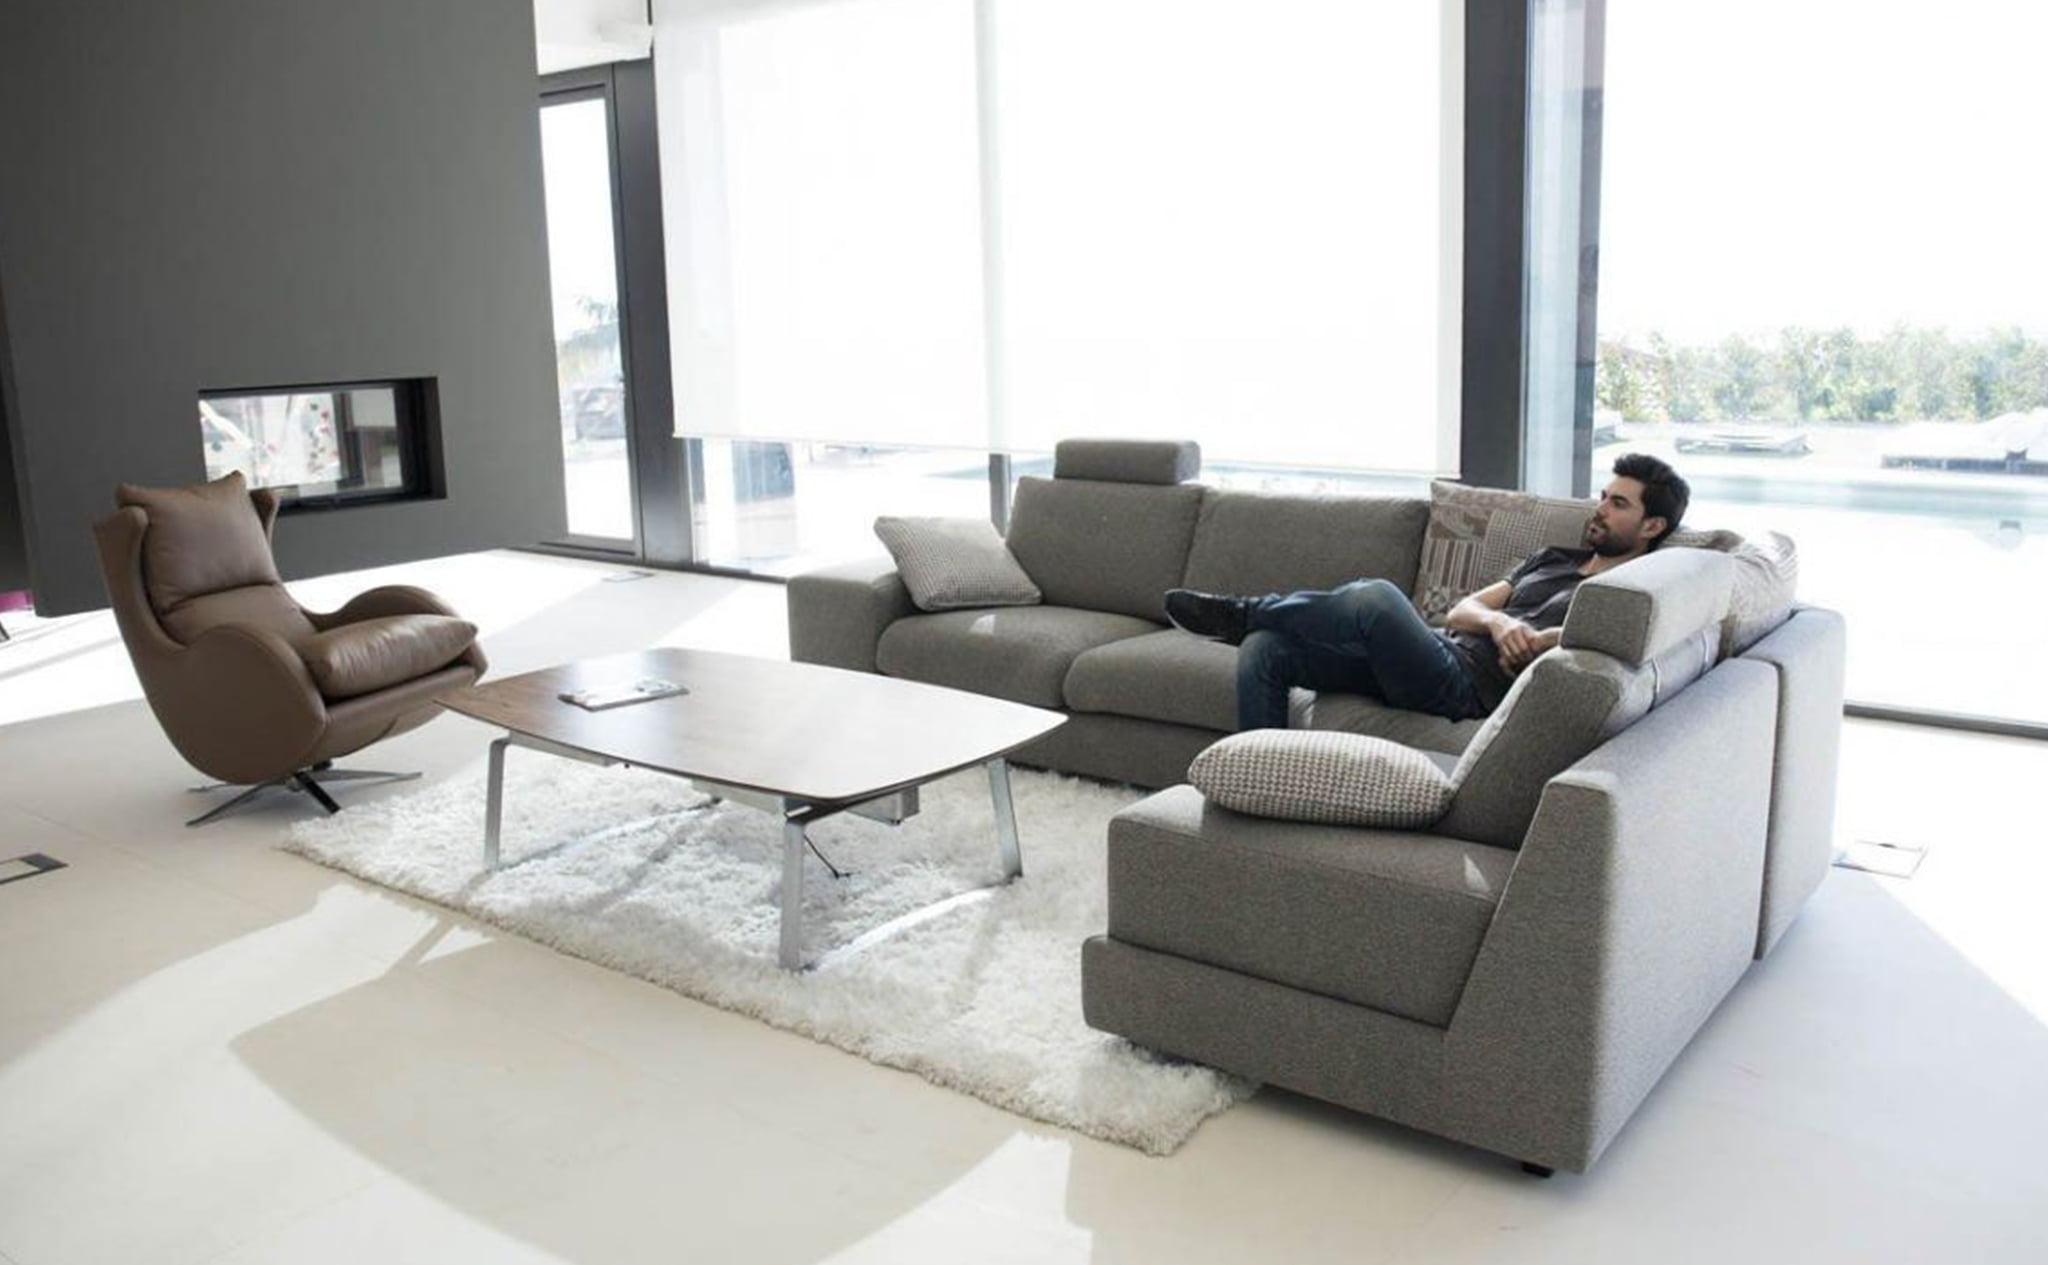 Canapés - Martínez Furniture